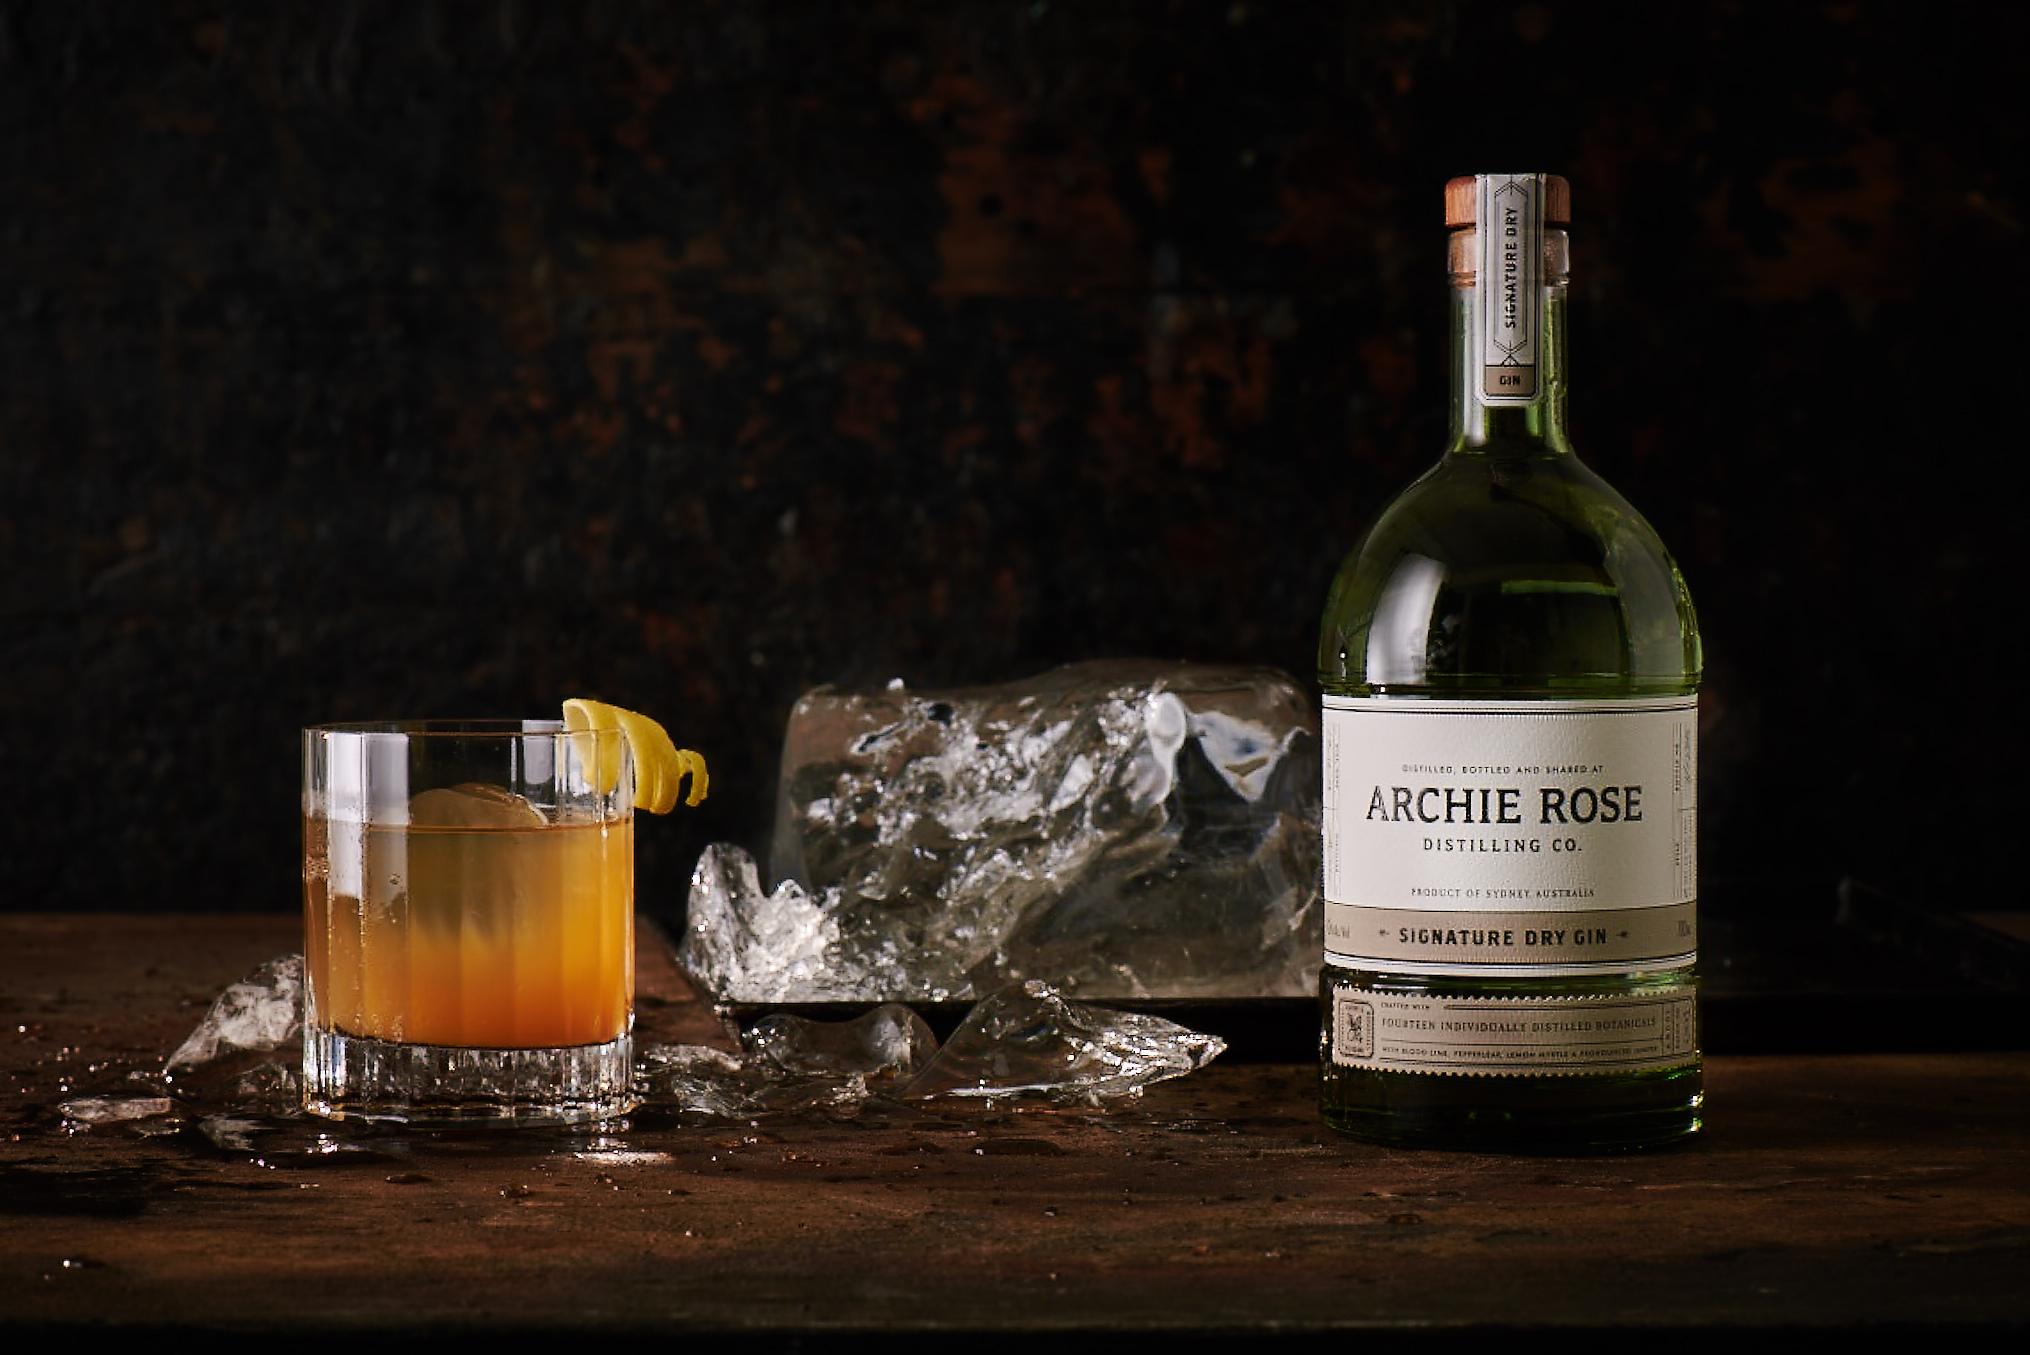 Archie Rose